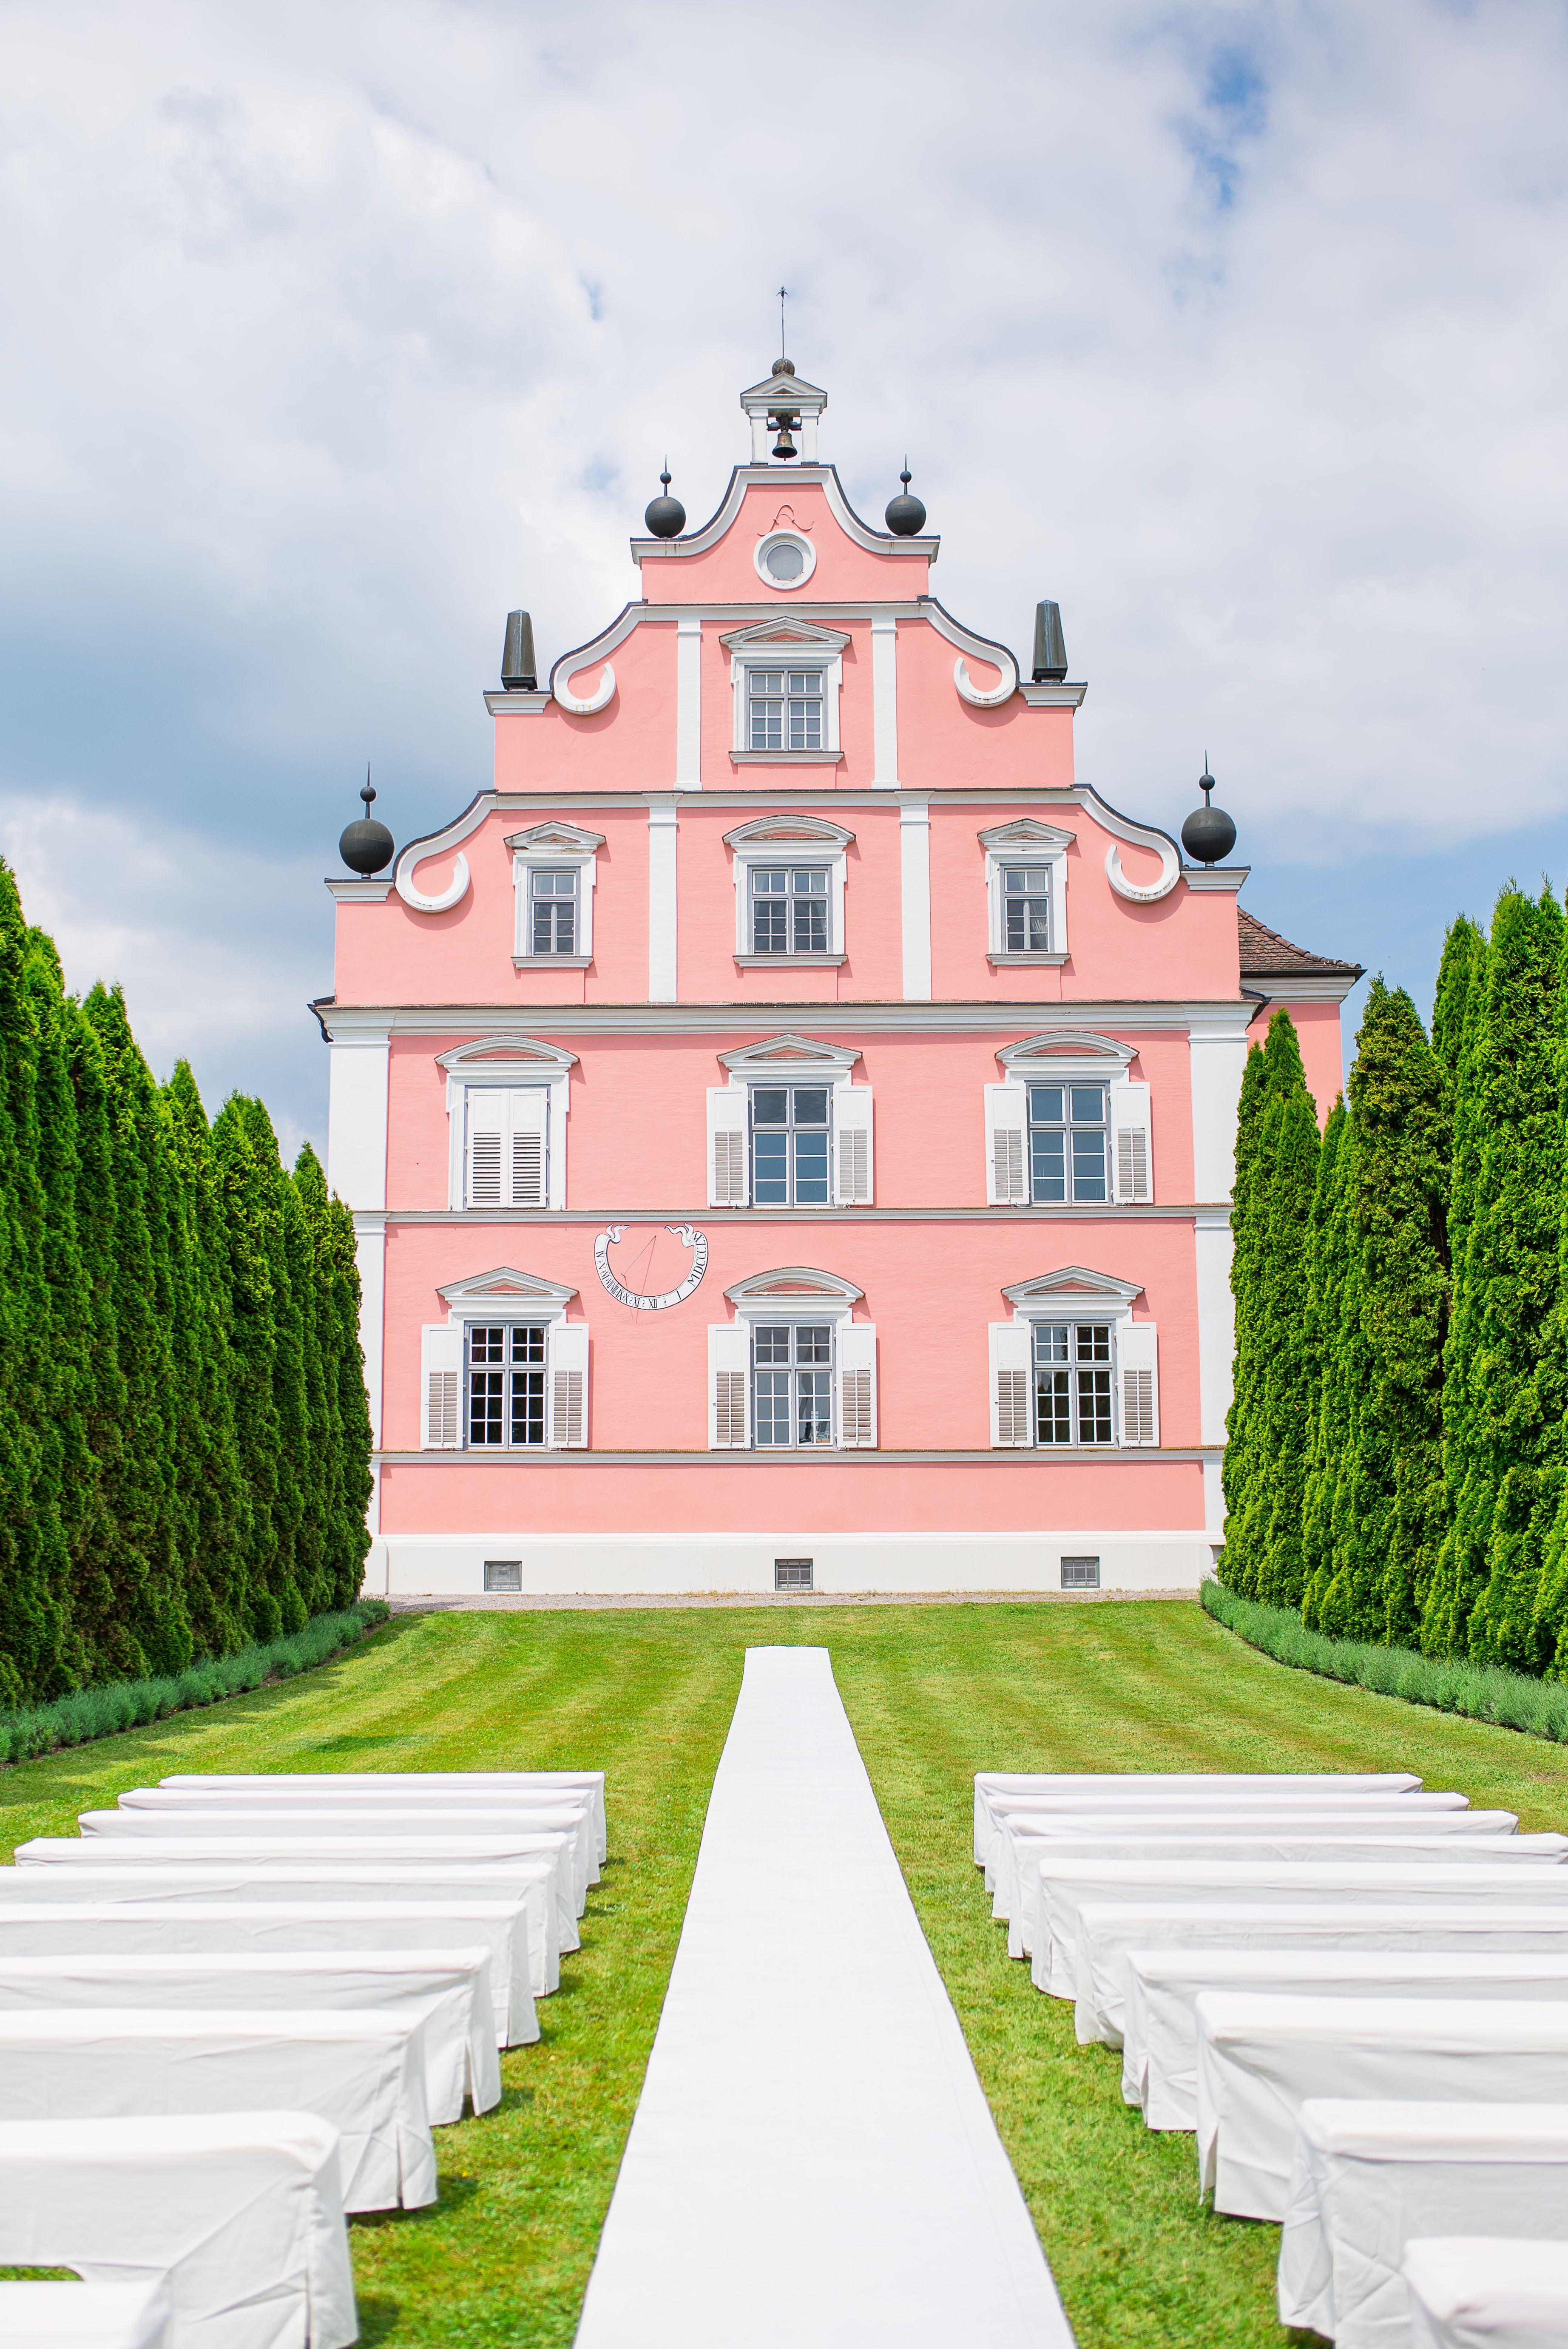 Apricot And Mint Green Spring Wedding Venue Schlossfreudental Schloss Freudental Hochzeit Im Fruhling In Apricot Un Burgen Und Schlosser Schloss Burg